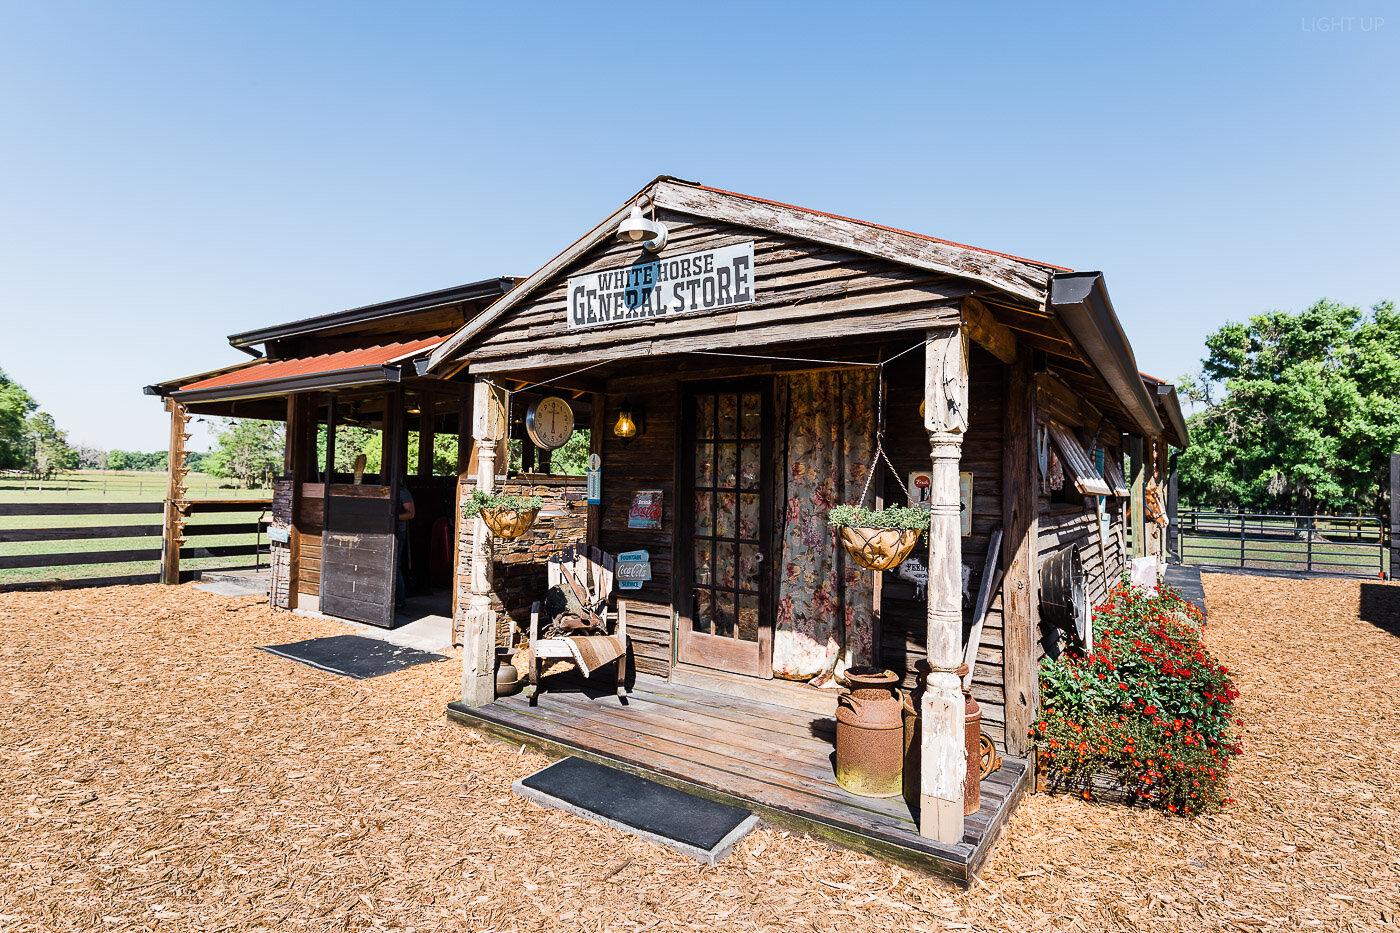 Lakeland-barn-wedding-at-white-horse-ranch-12.jpg